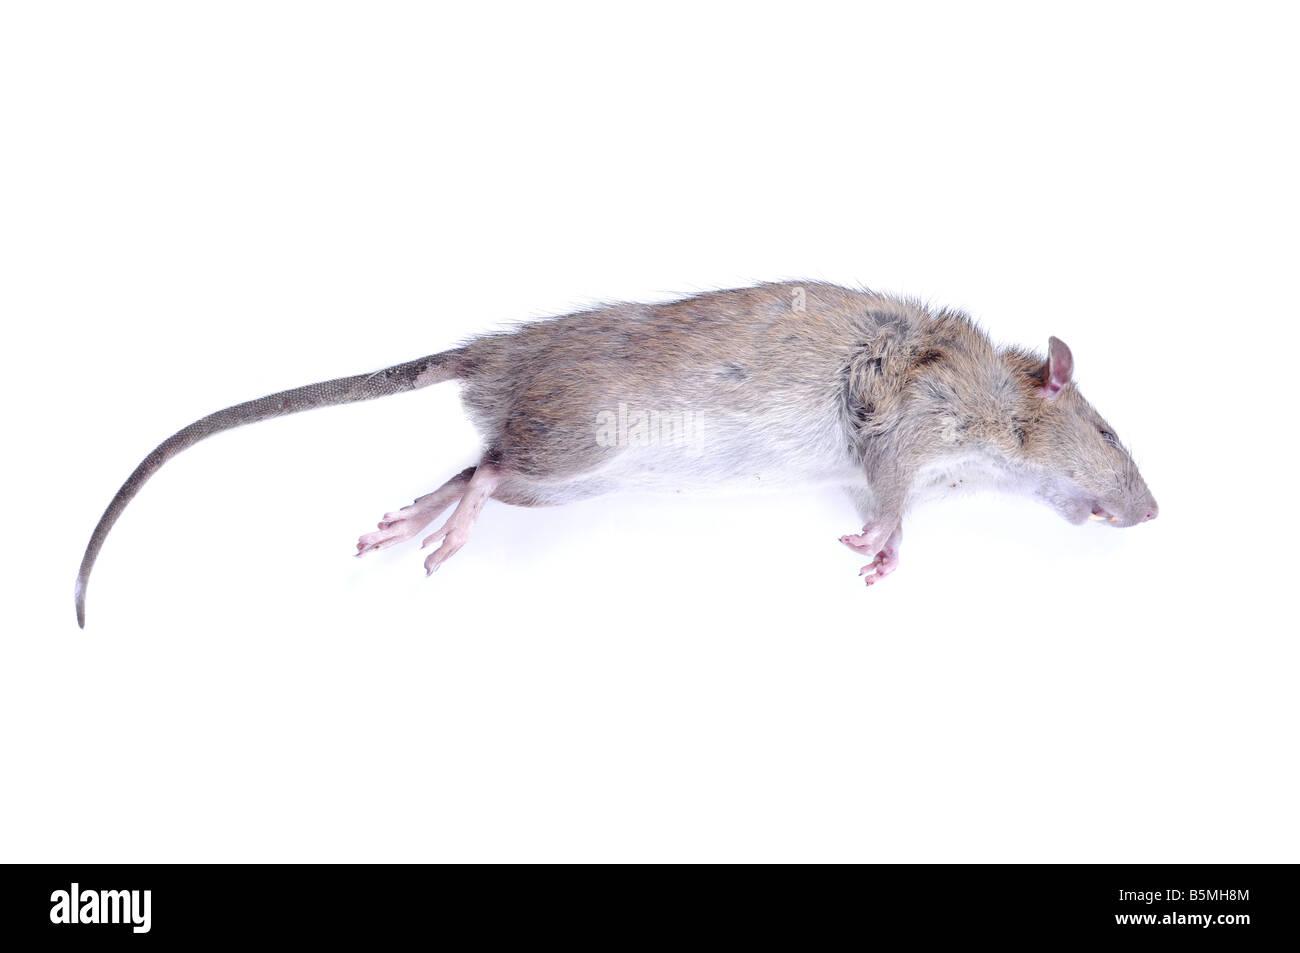 Dead rat lying on white background. - Stock Image